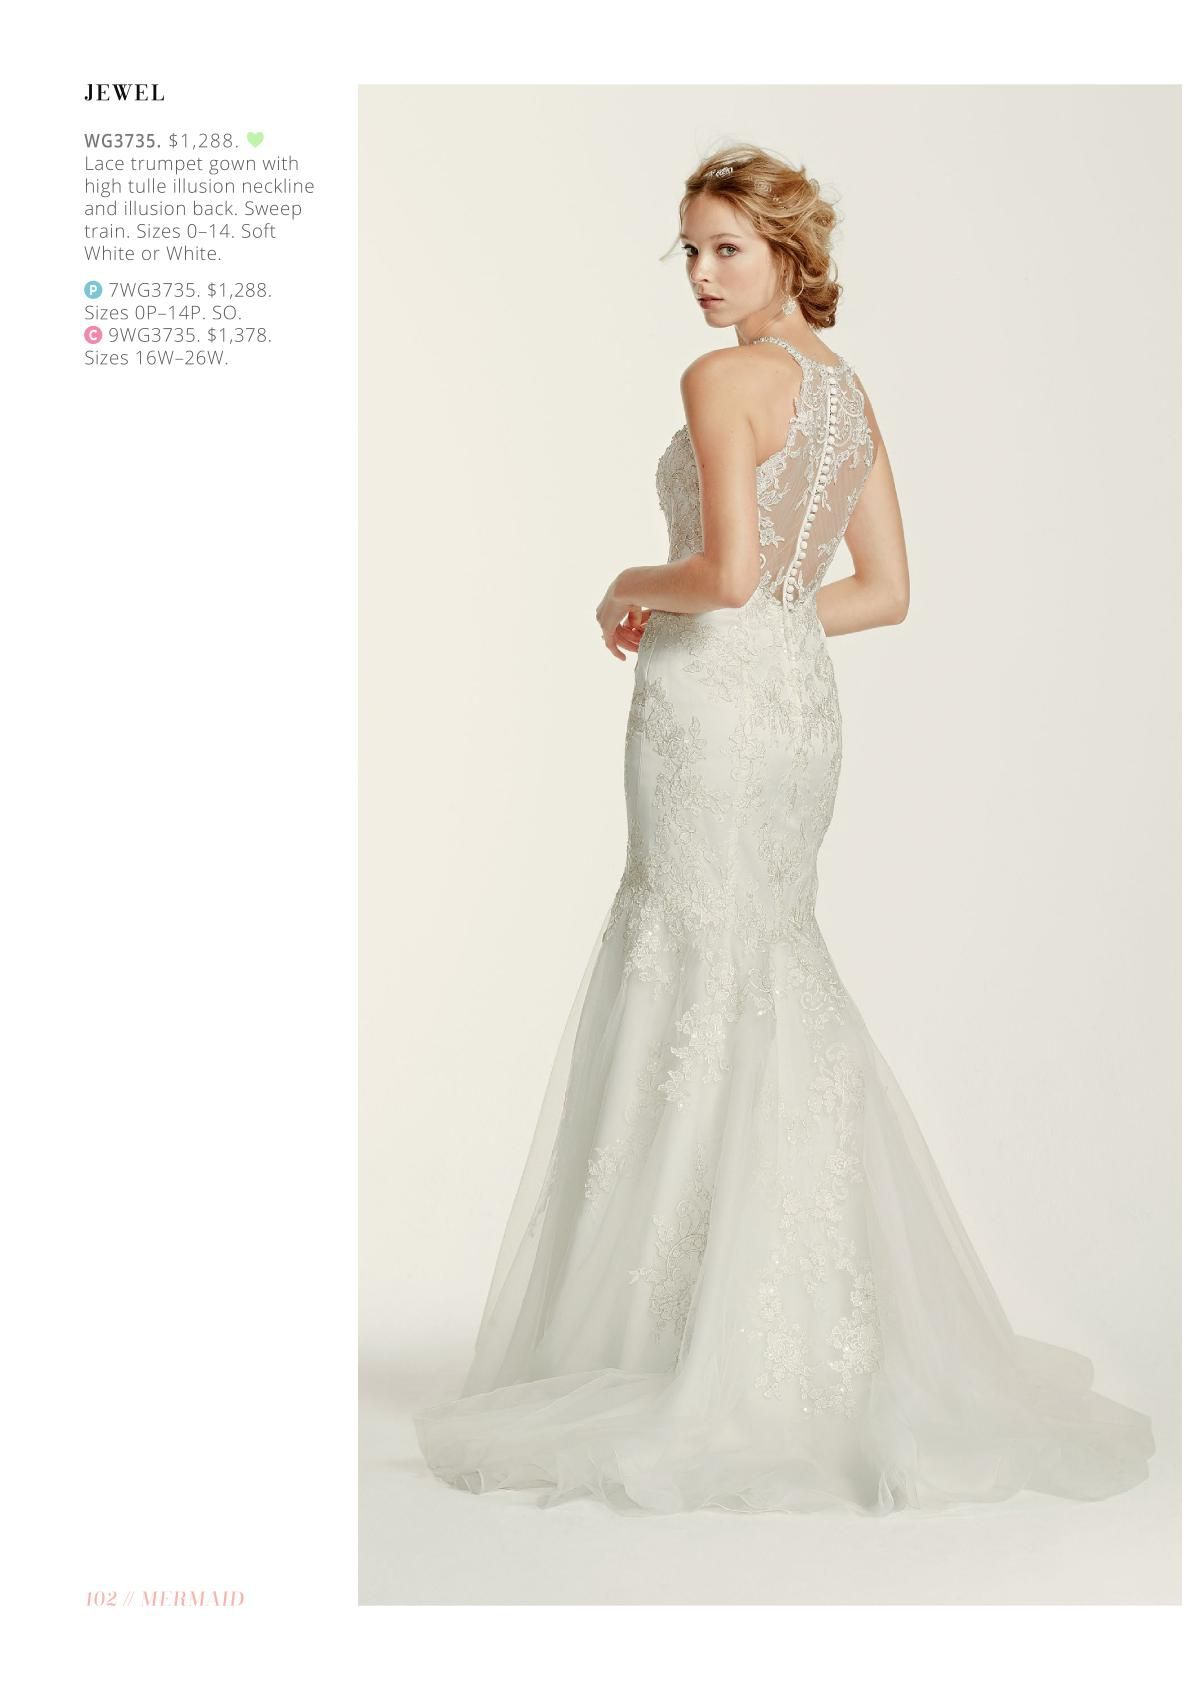 c8f3b596698 Wedding Gown For Bride Online